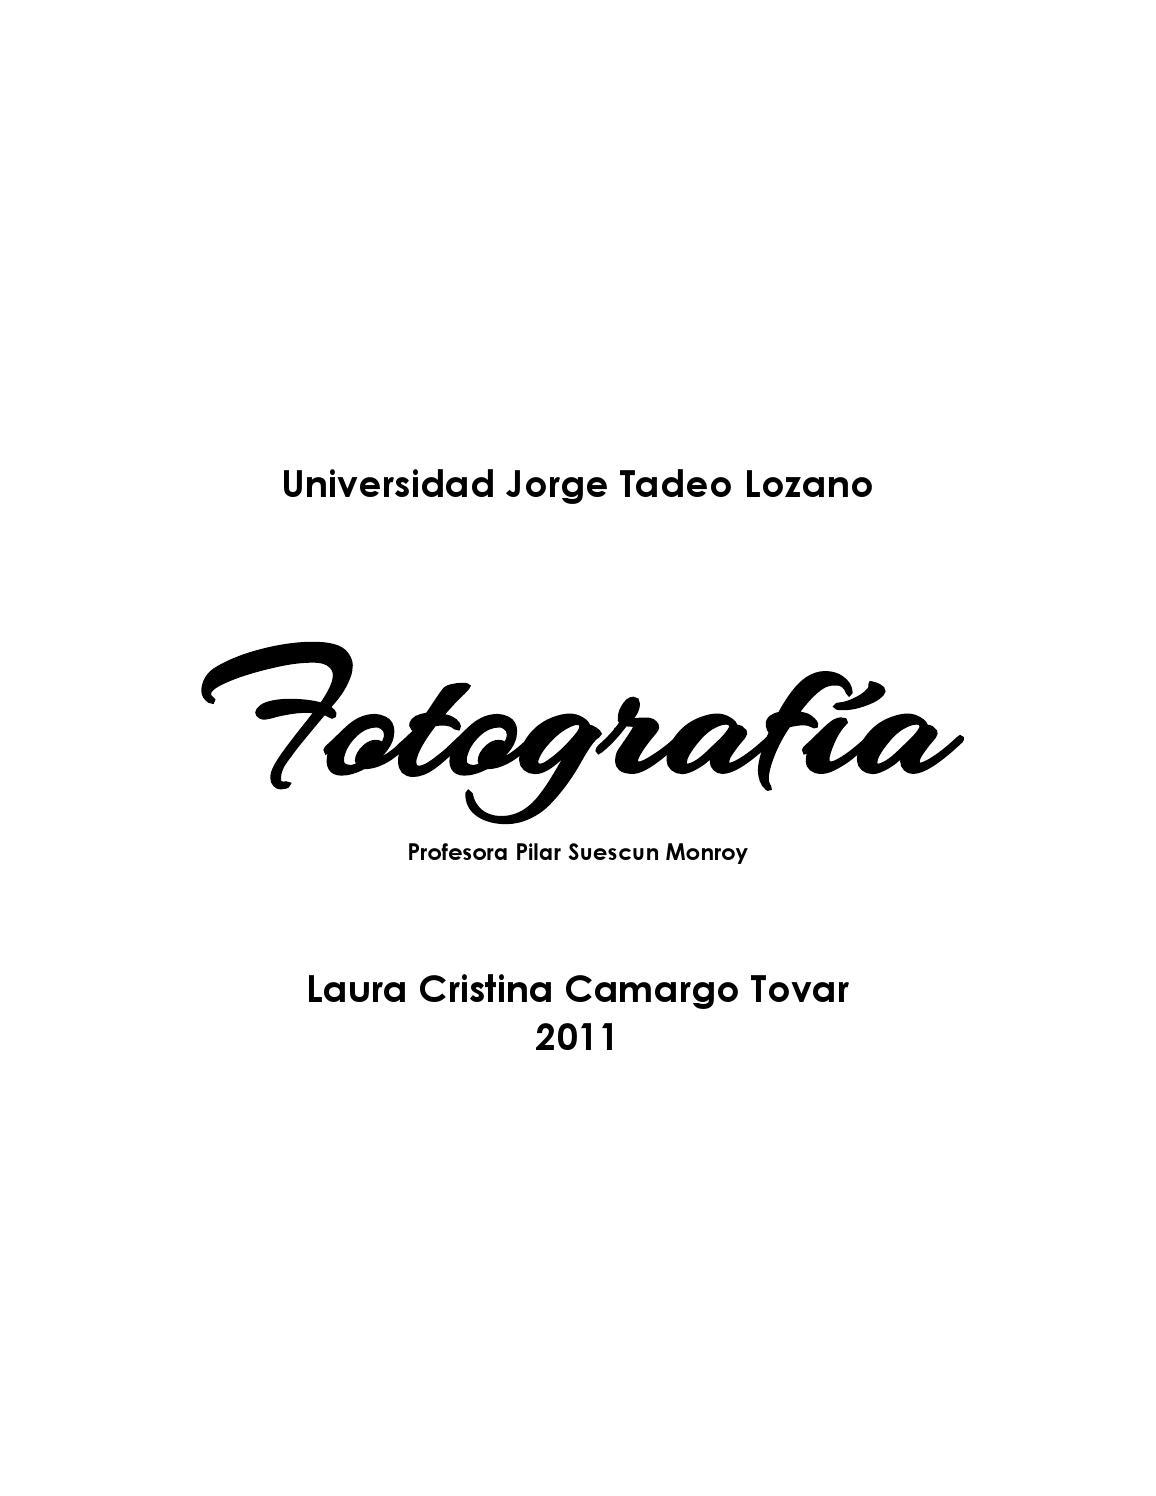 Bitacora final fotografía laura camargo by Laura Sophia - issuu